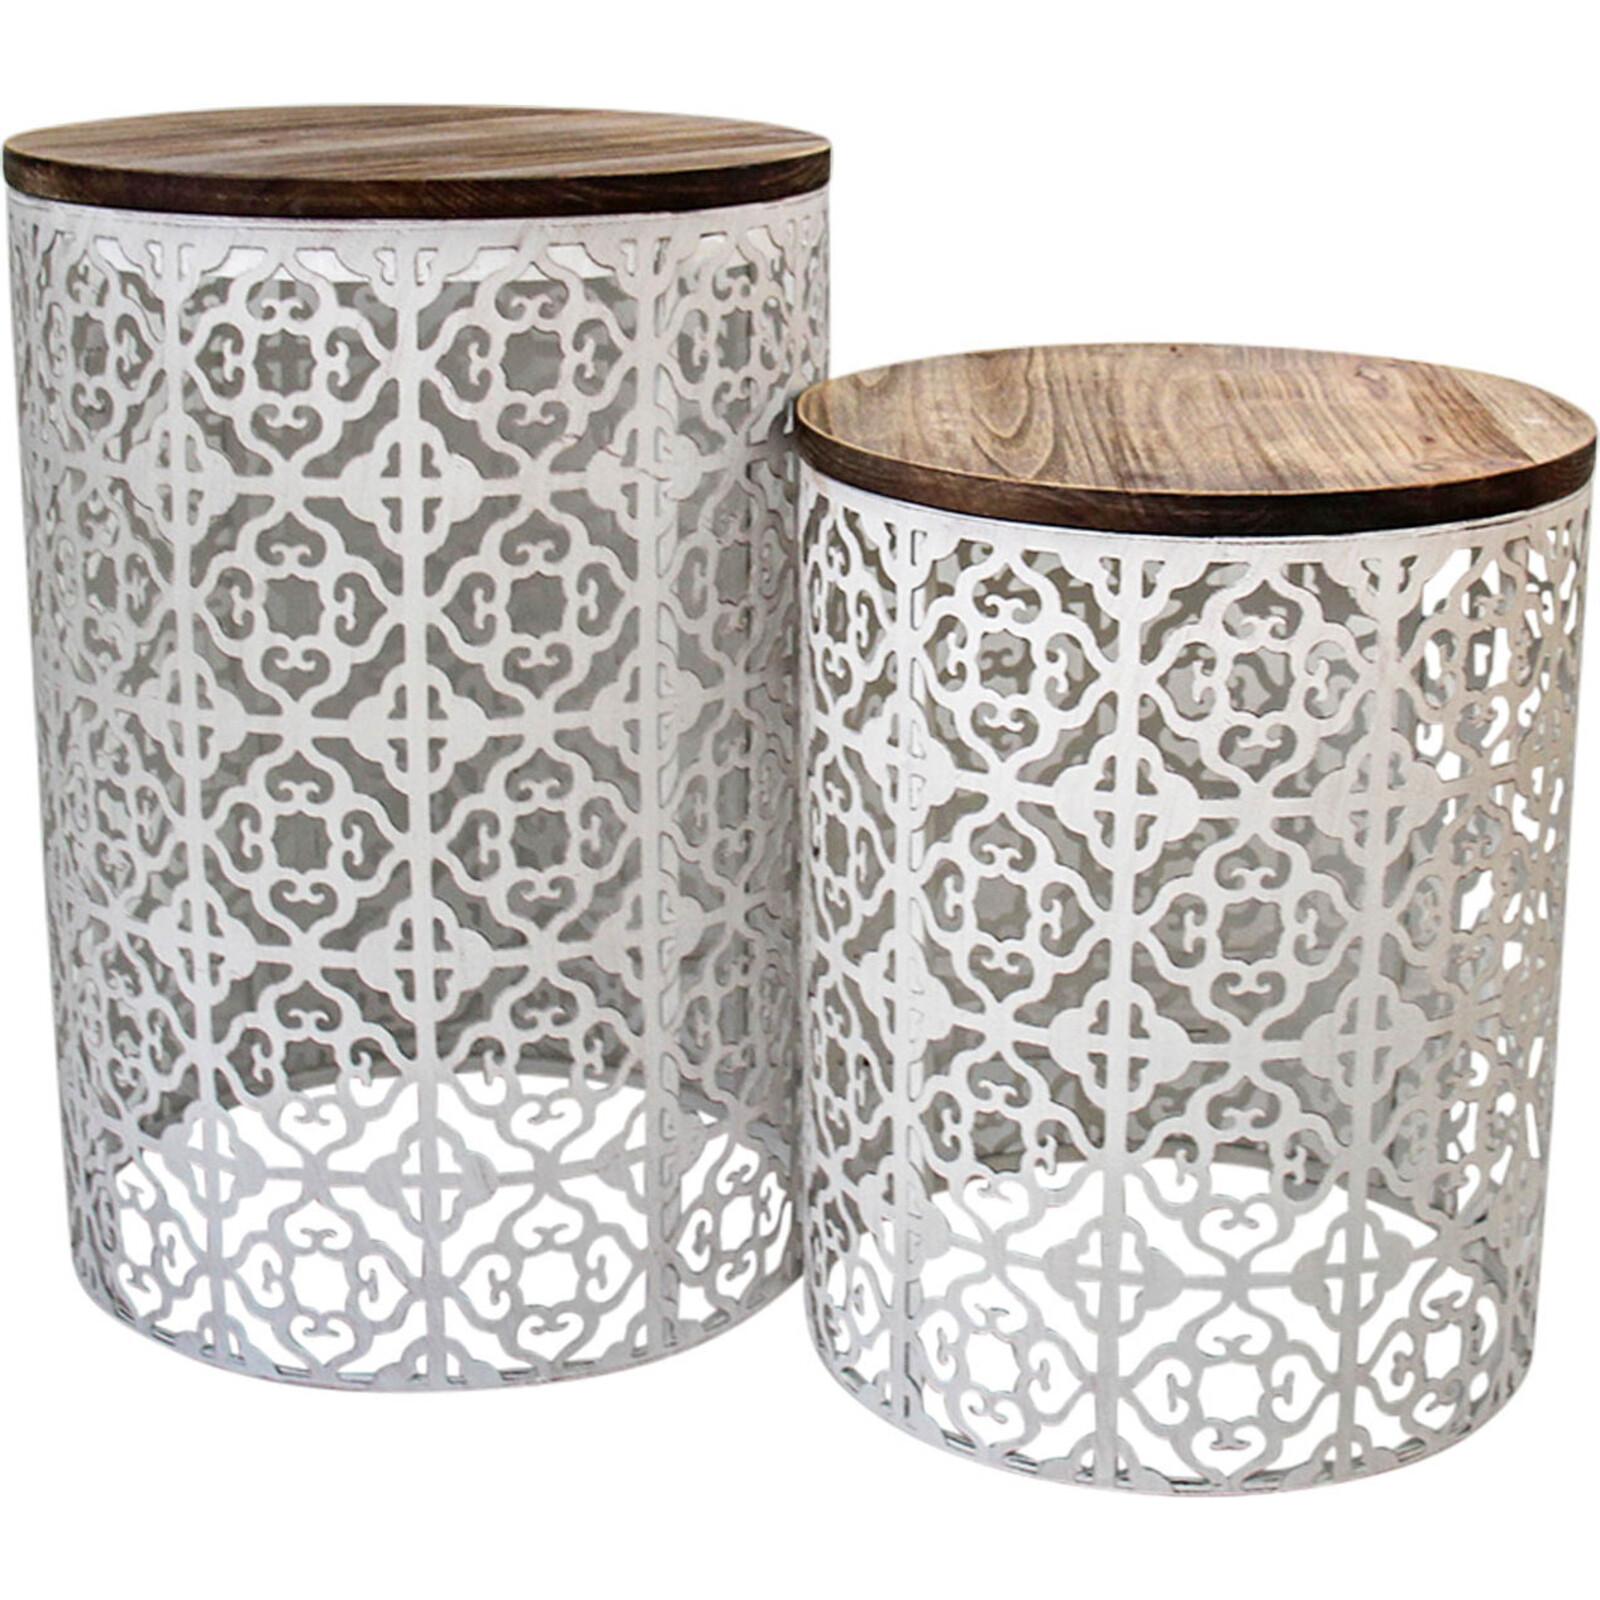 Drum Tables Moroc S/2 White